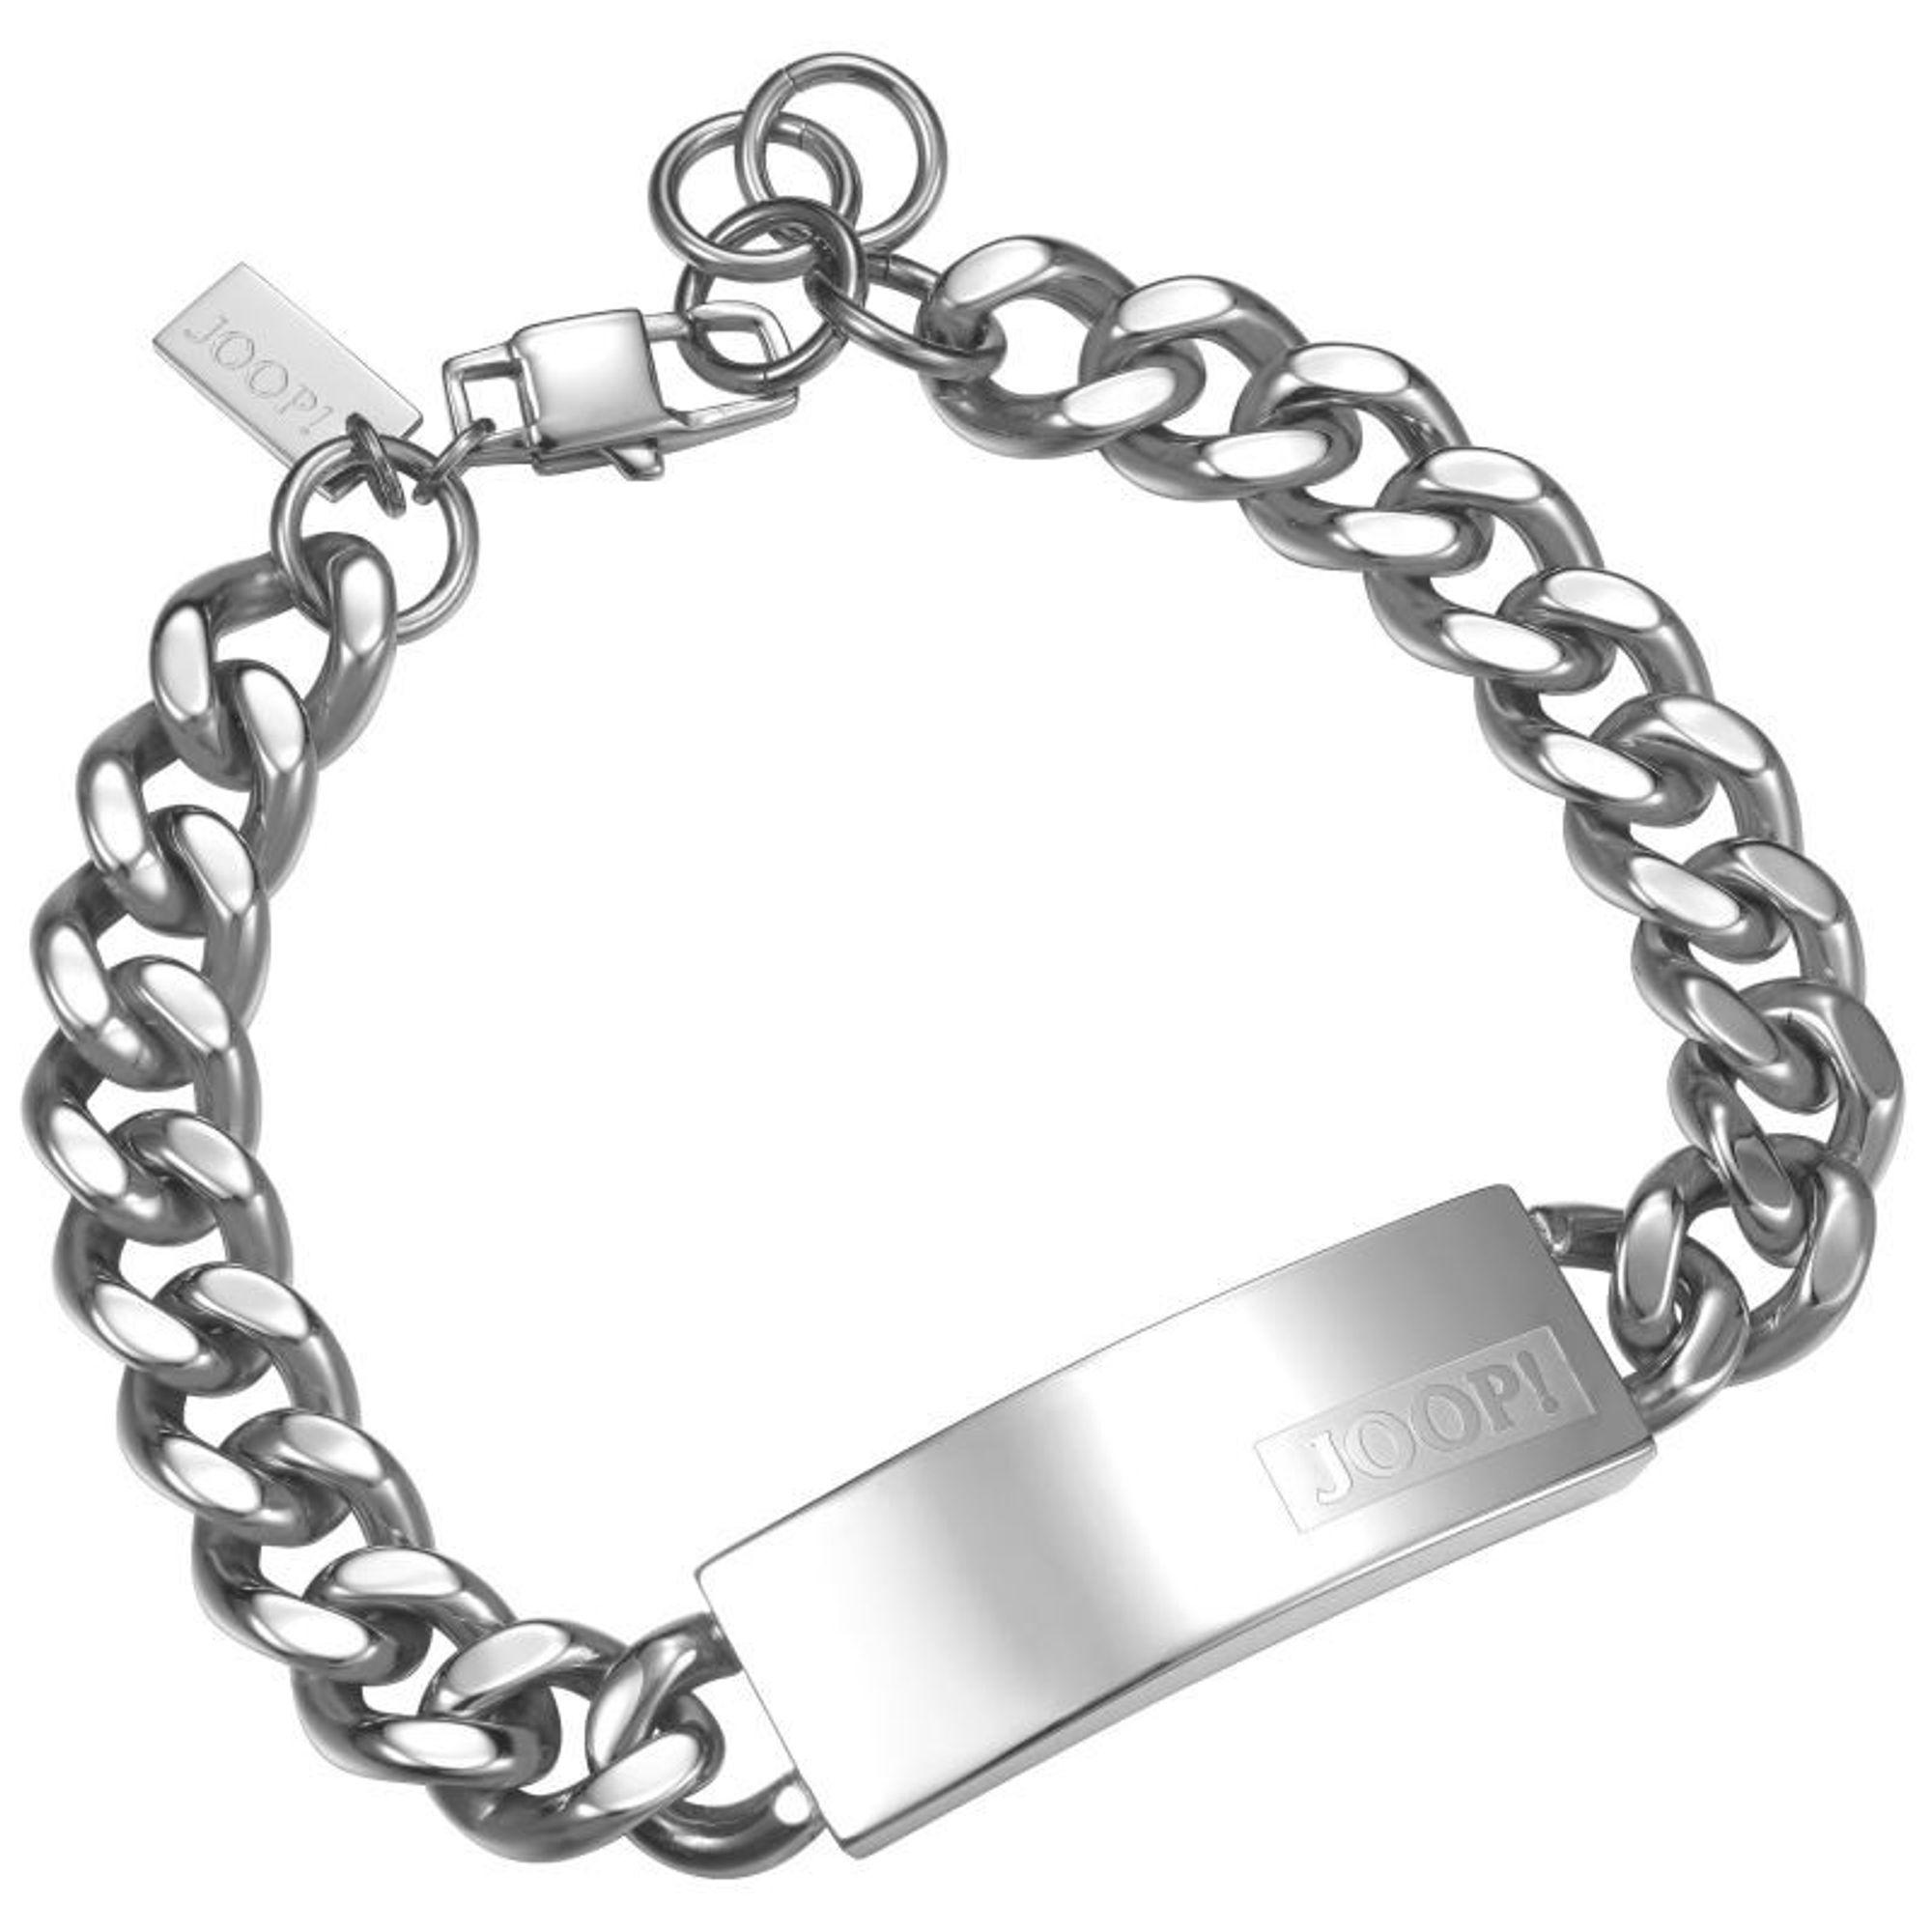 Joop JPBR10616A215 Herren Gravur-Armband Logo Signature Stahl 23,5 cm